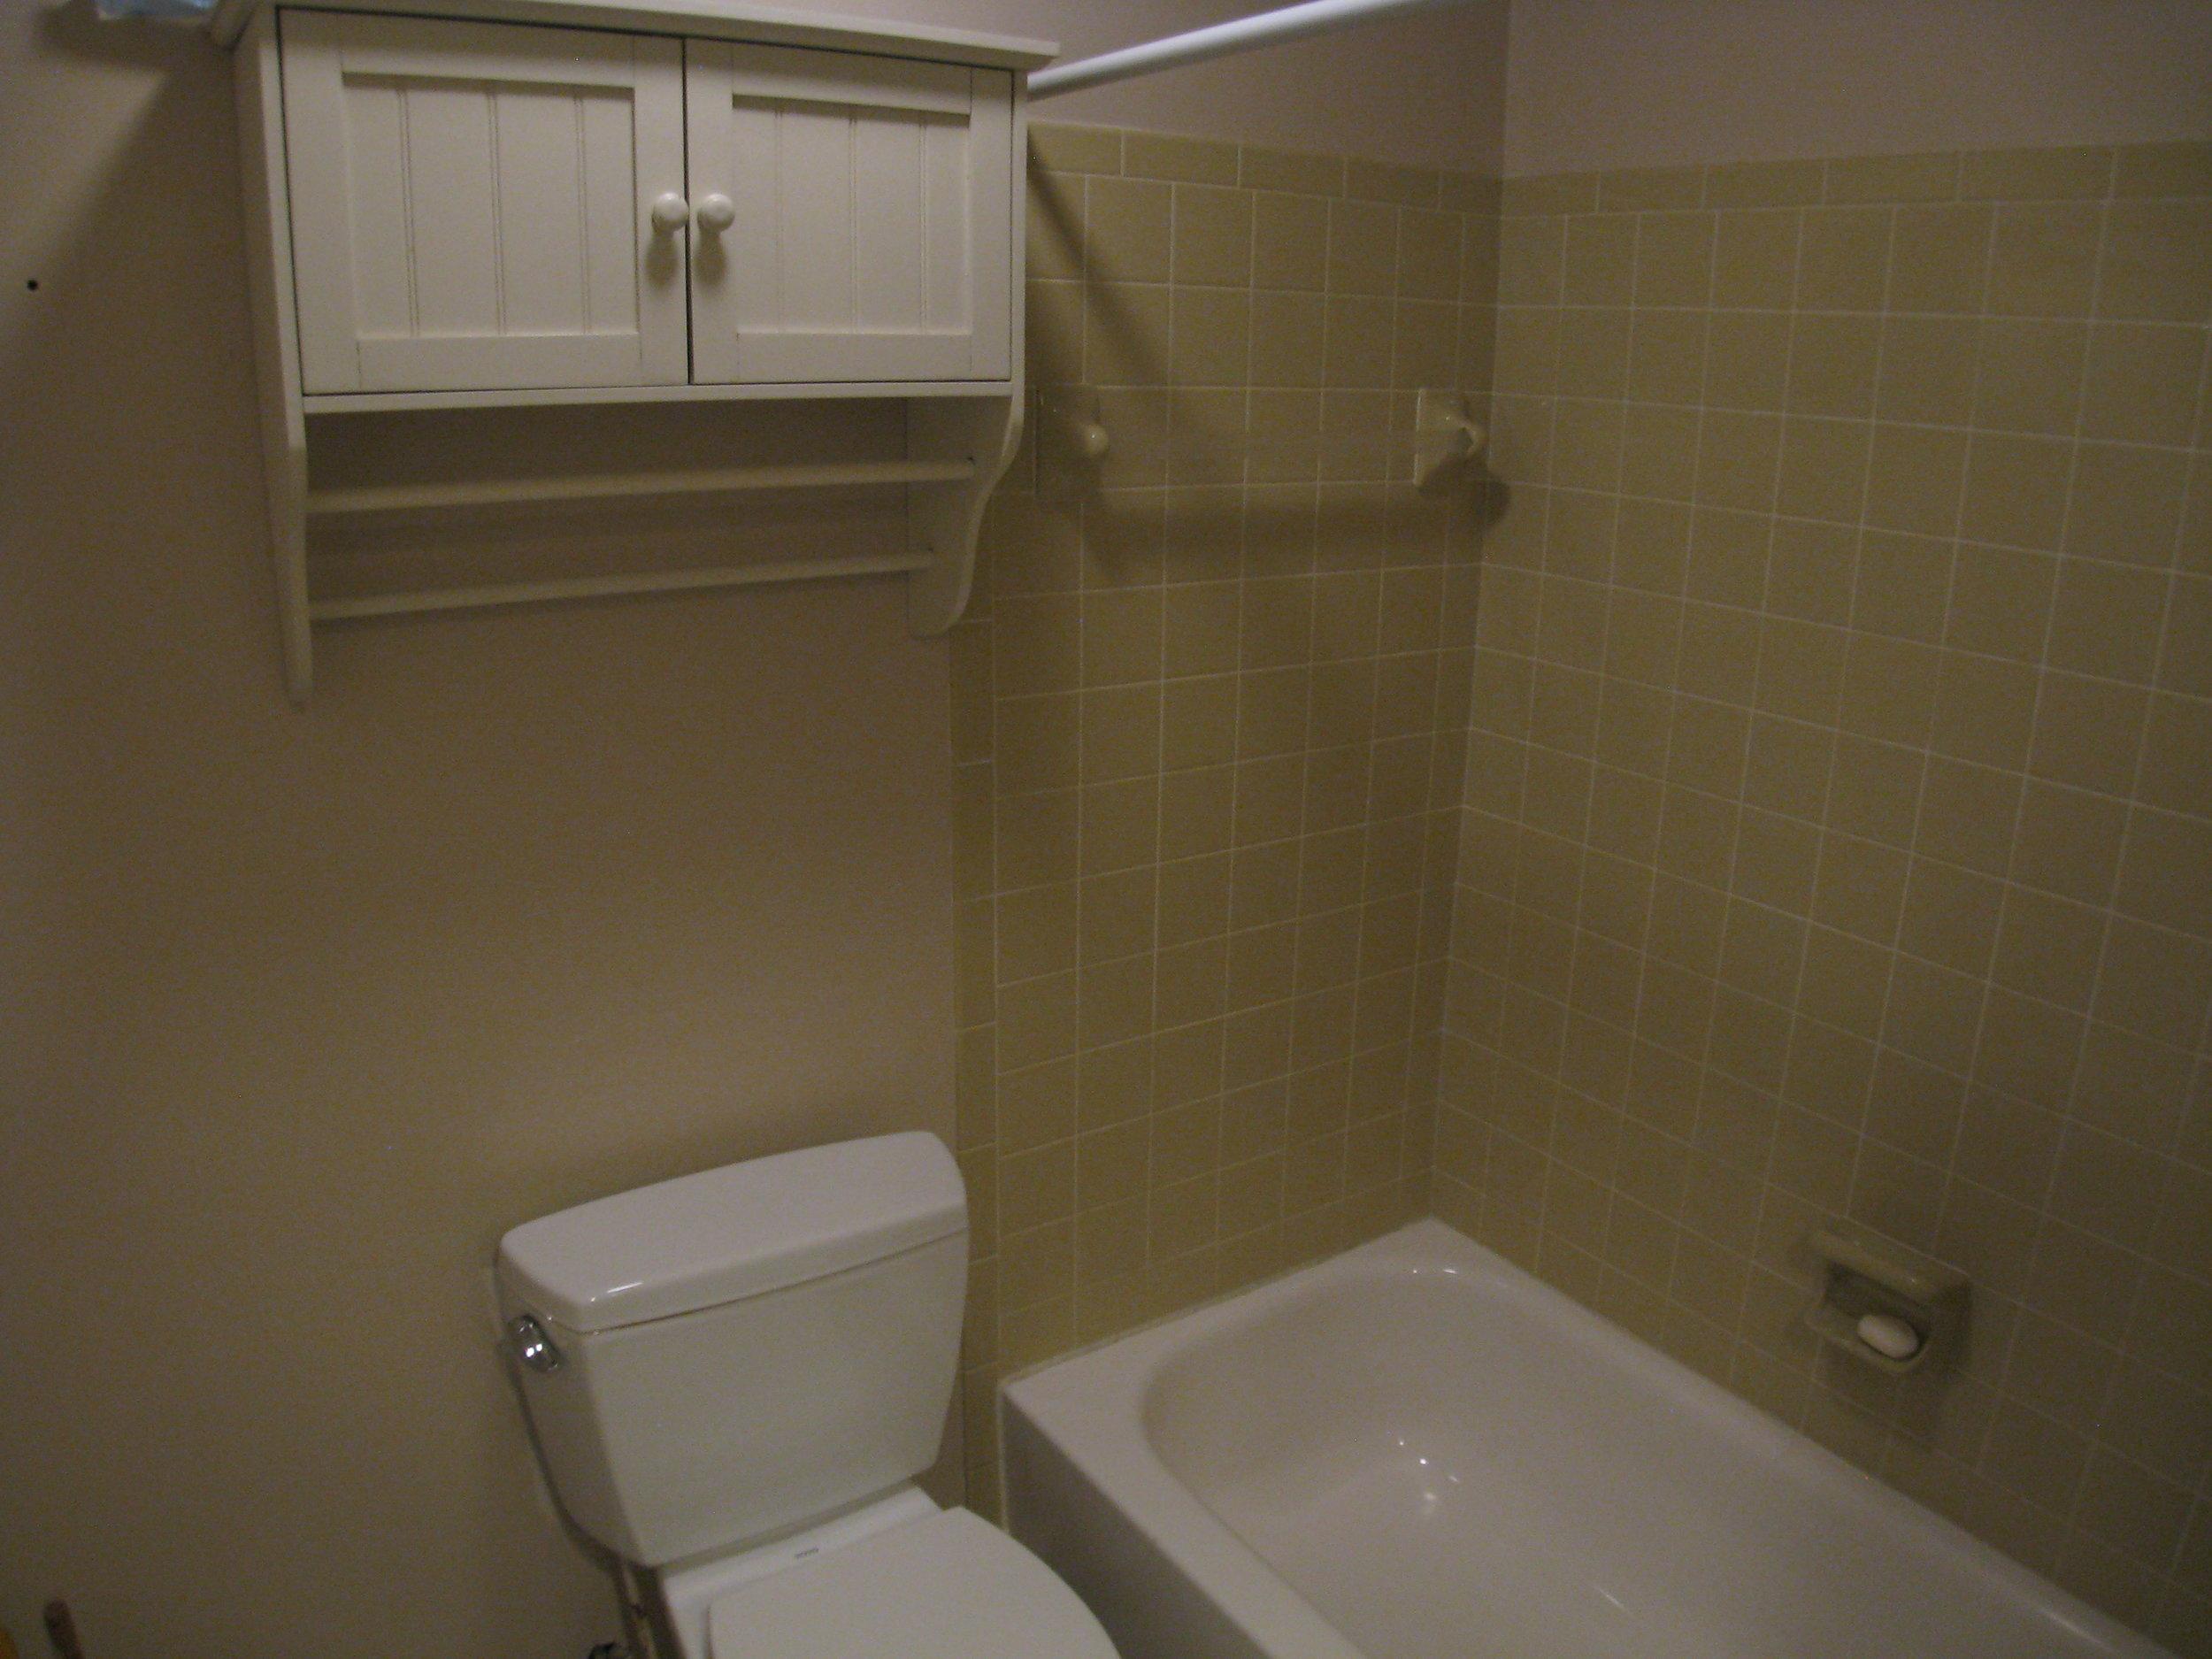 Shared Second Floor Full Bath